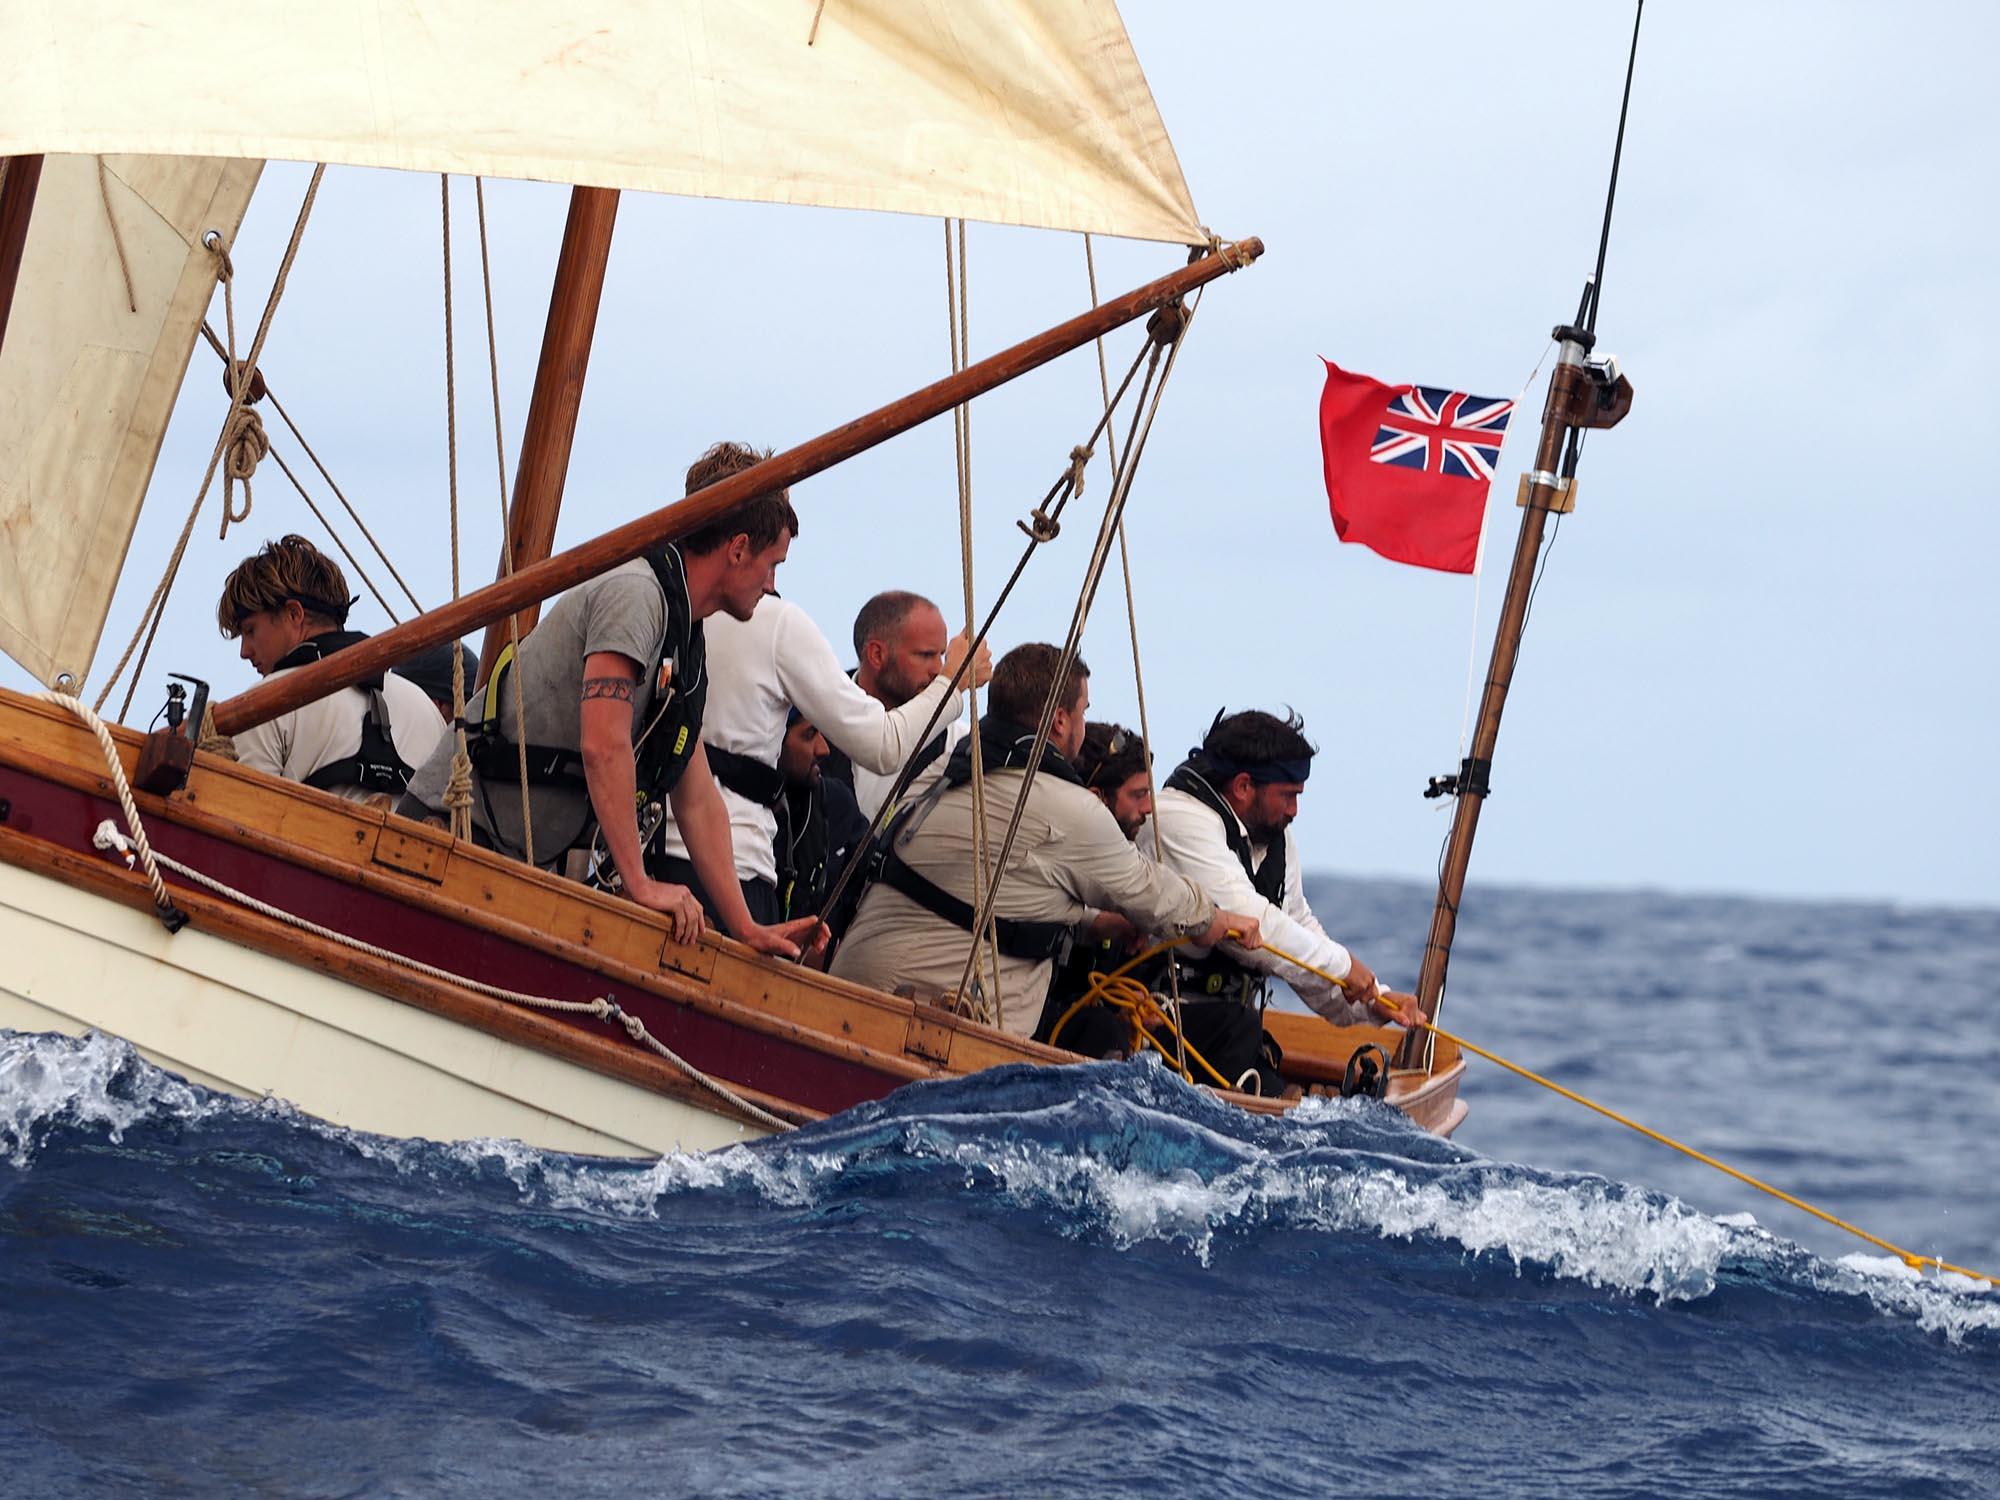 Mutiny on the Ship Watchdog 47